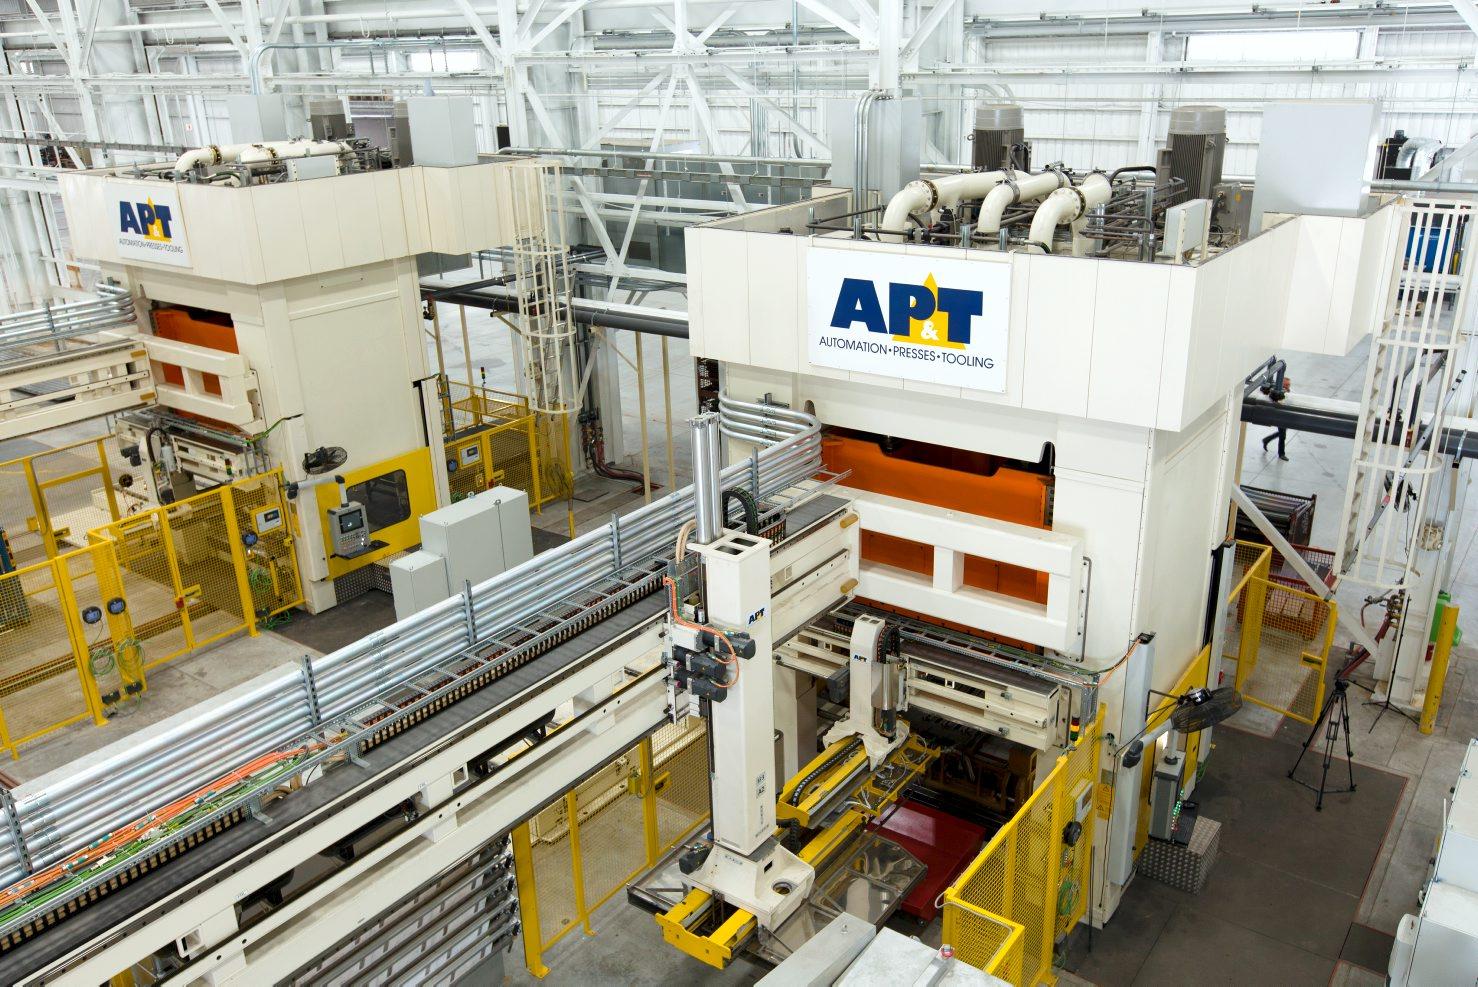 Valkommen Till Ap T S Monter Pa Mach Tool Metal Supply Se